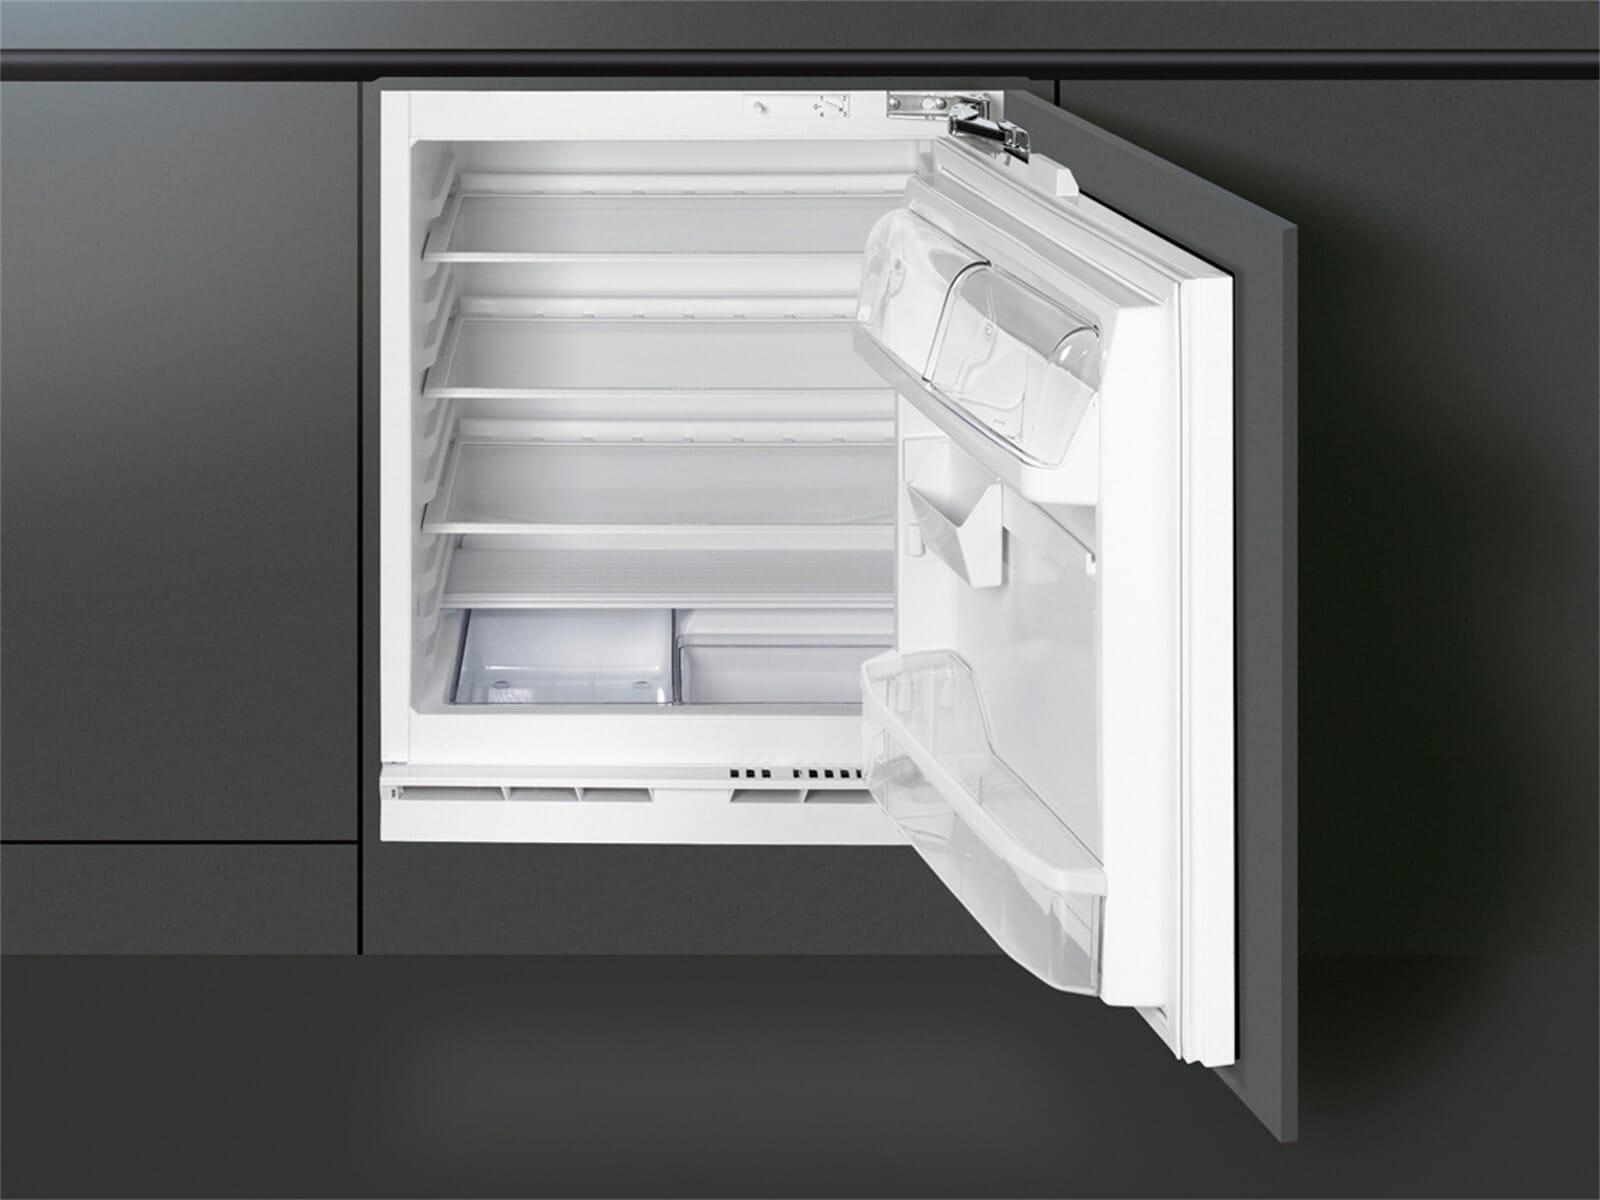 Aeg Unterbau Kühlschrank Dekorfähig : Unterbau kühlschrank dekorfähig unterbau kuhlschrank angebote